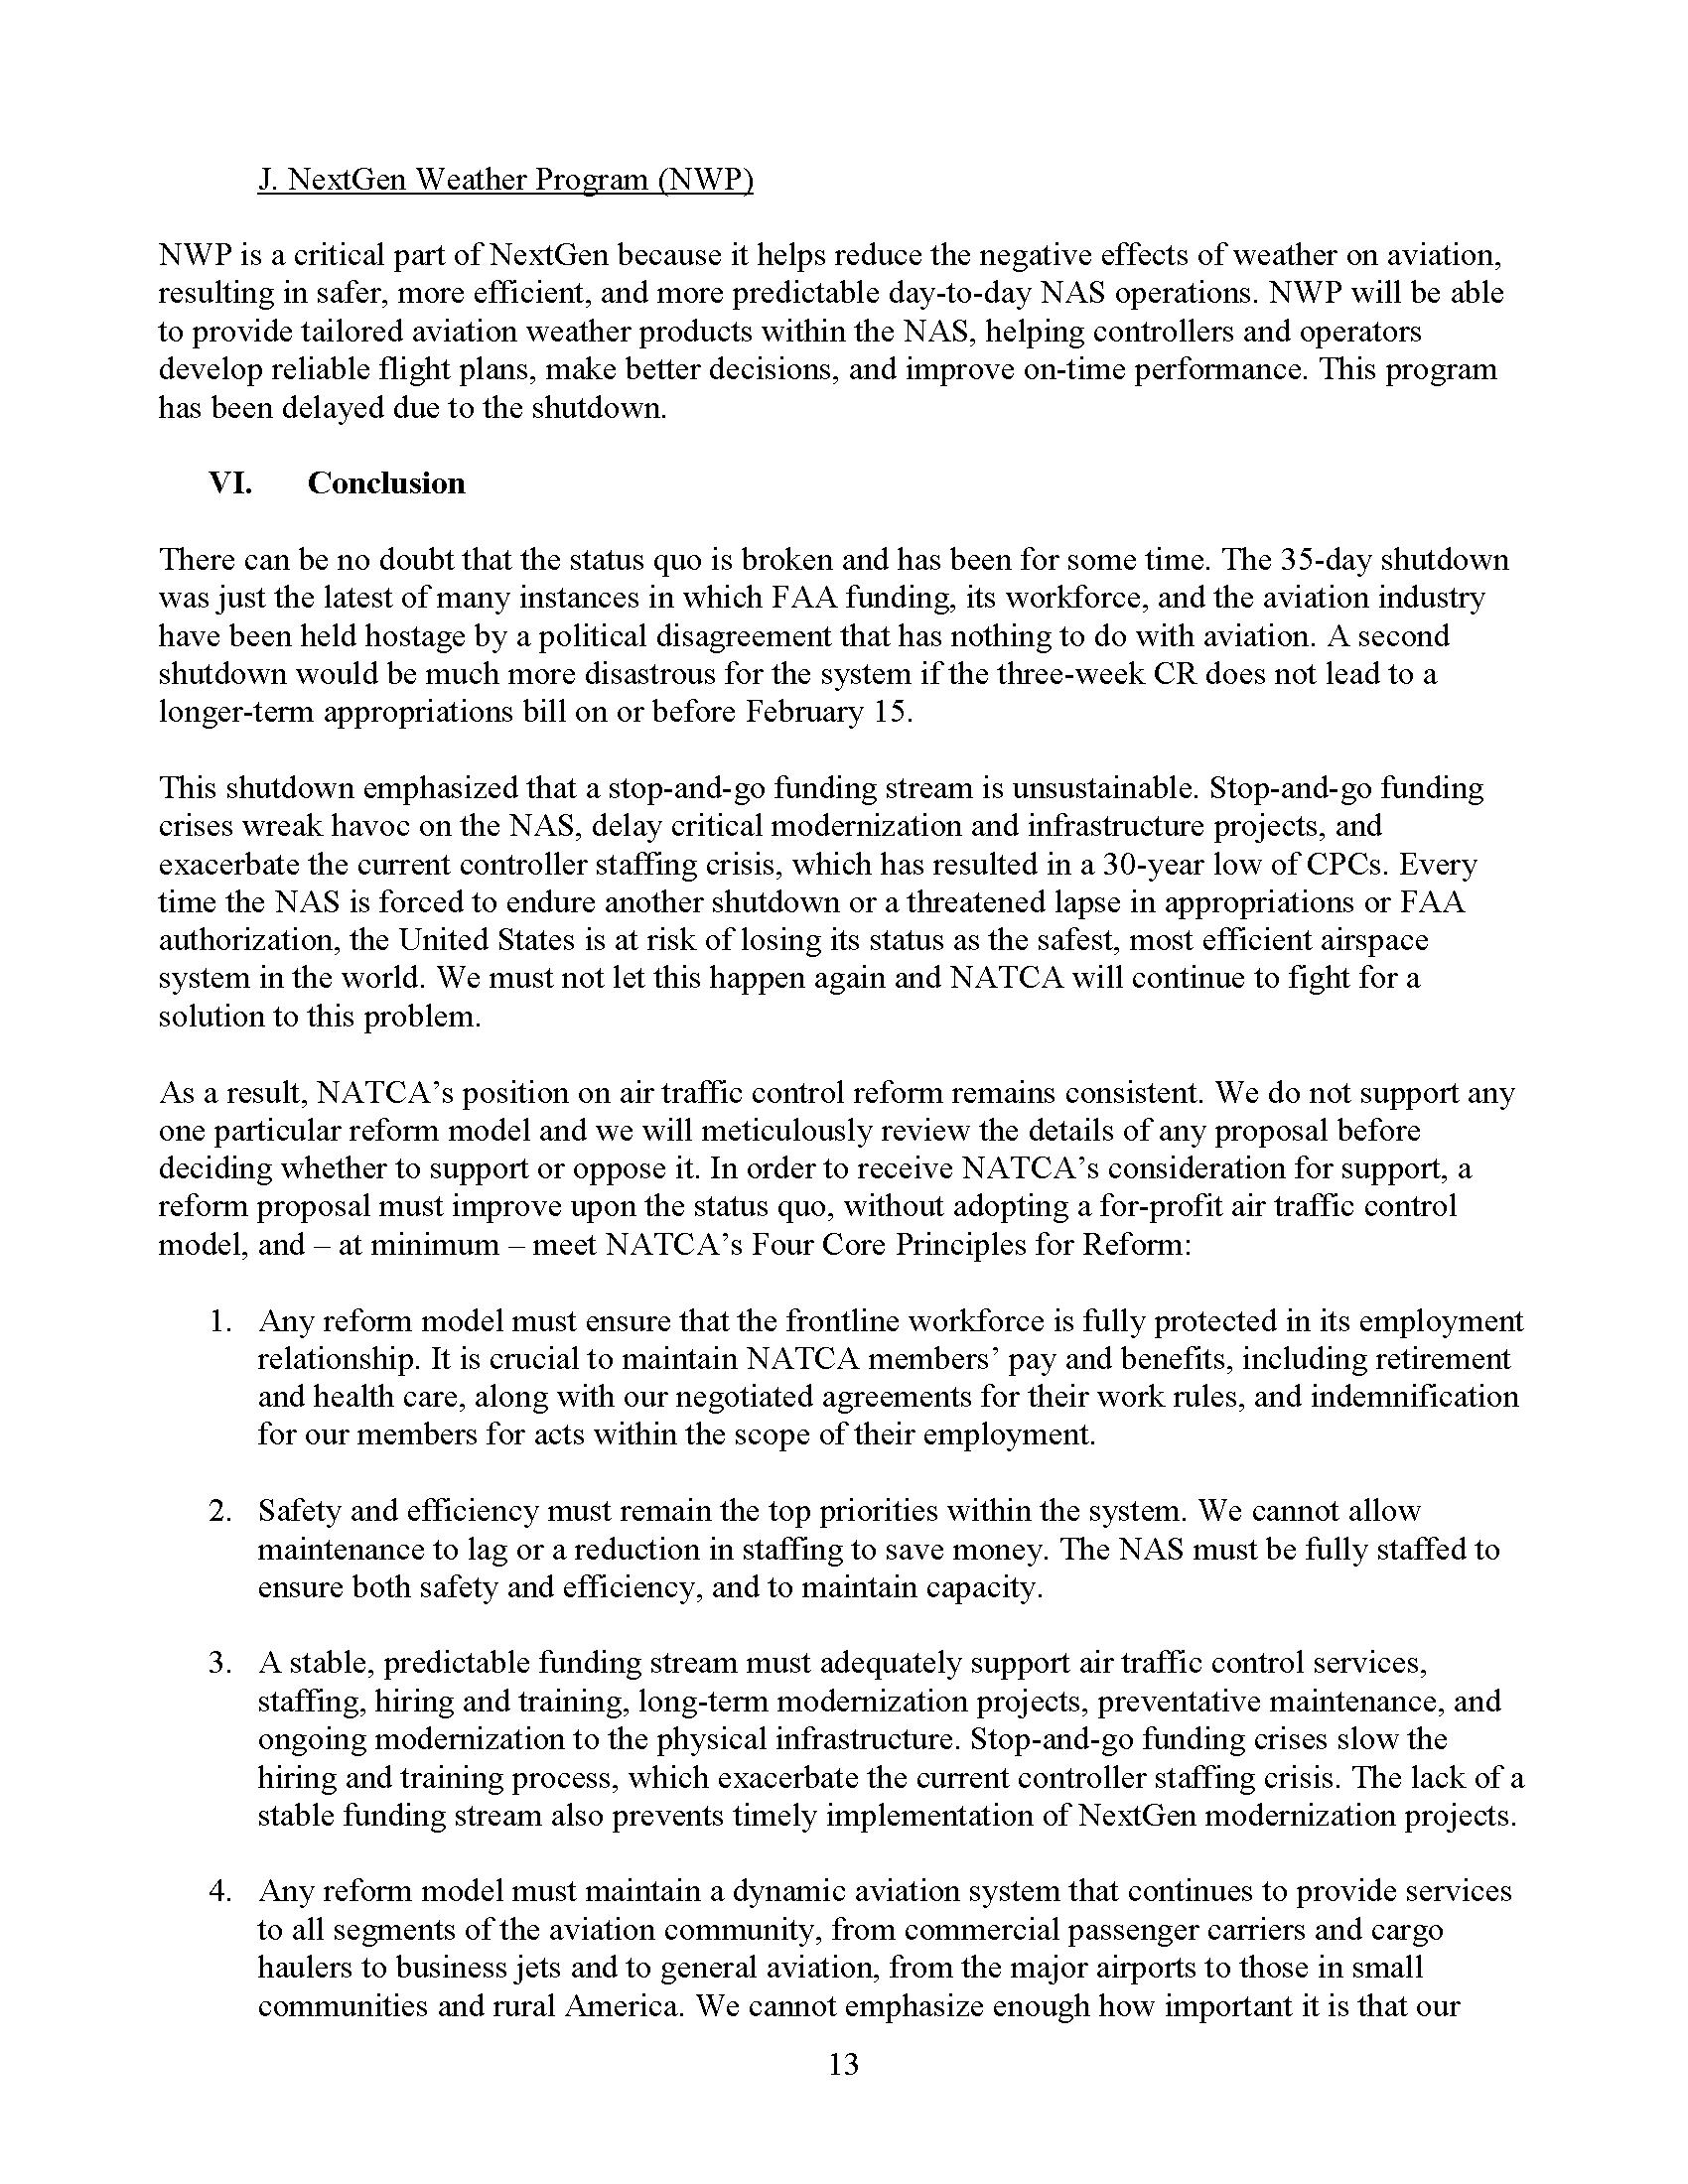 NATCA Paul Rinaldi Written Testimony for TI Aviation Subcommittee Feb 13 2019 FINAL Page 01